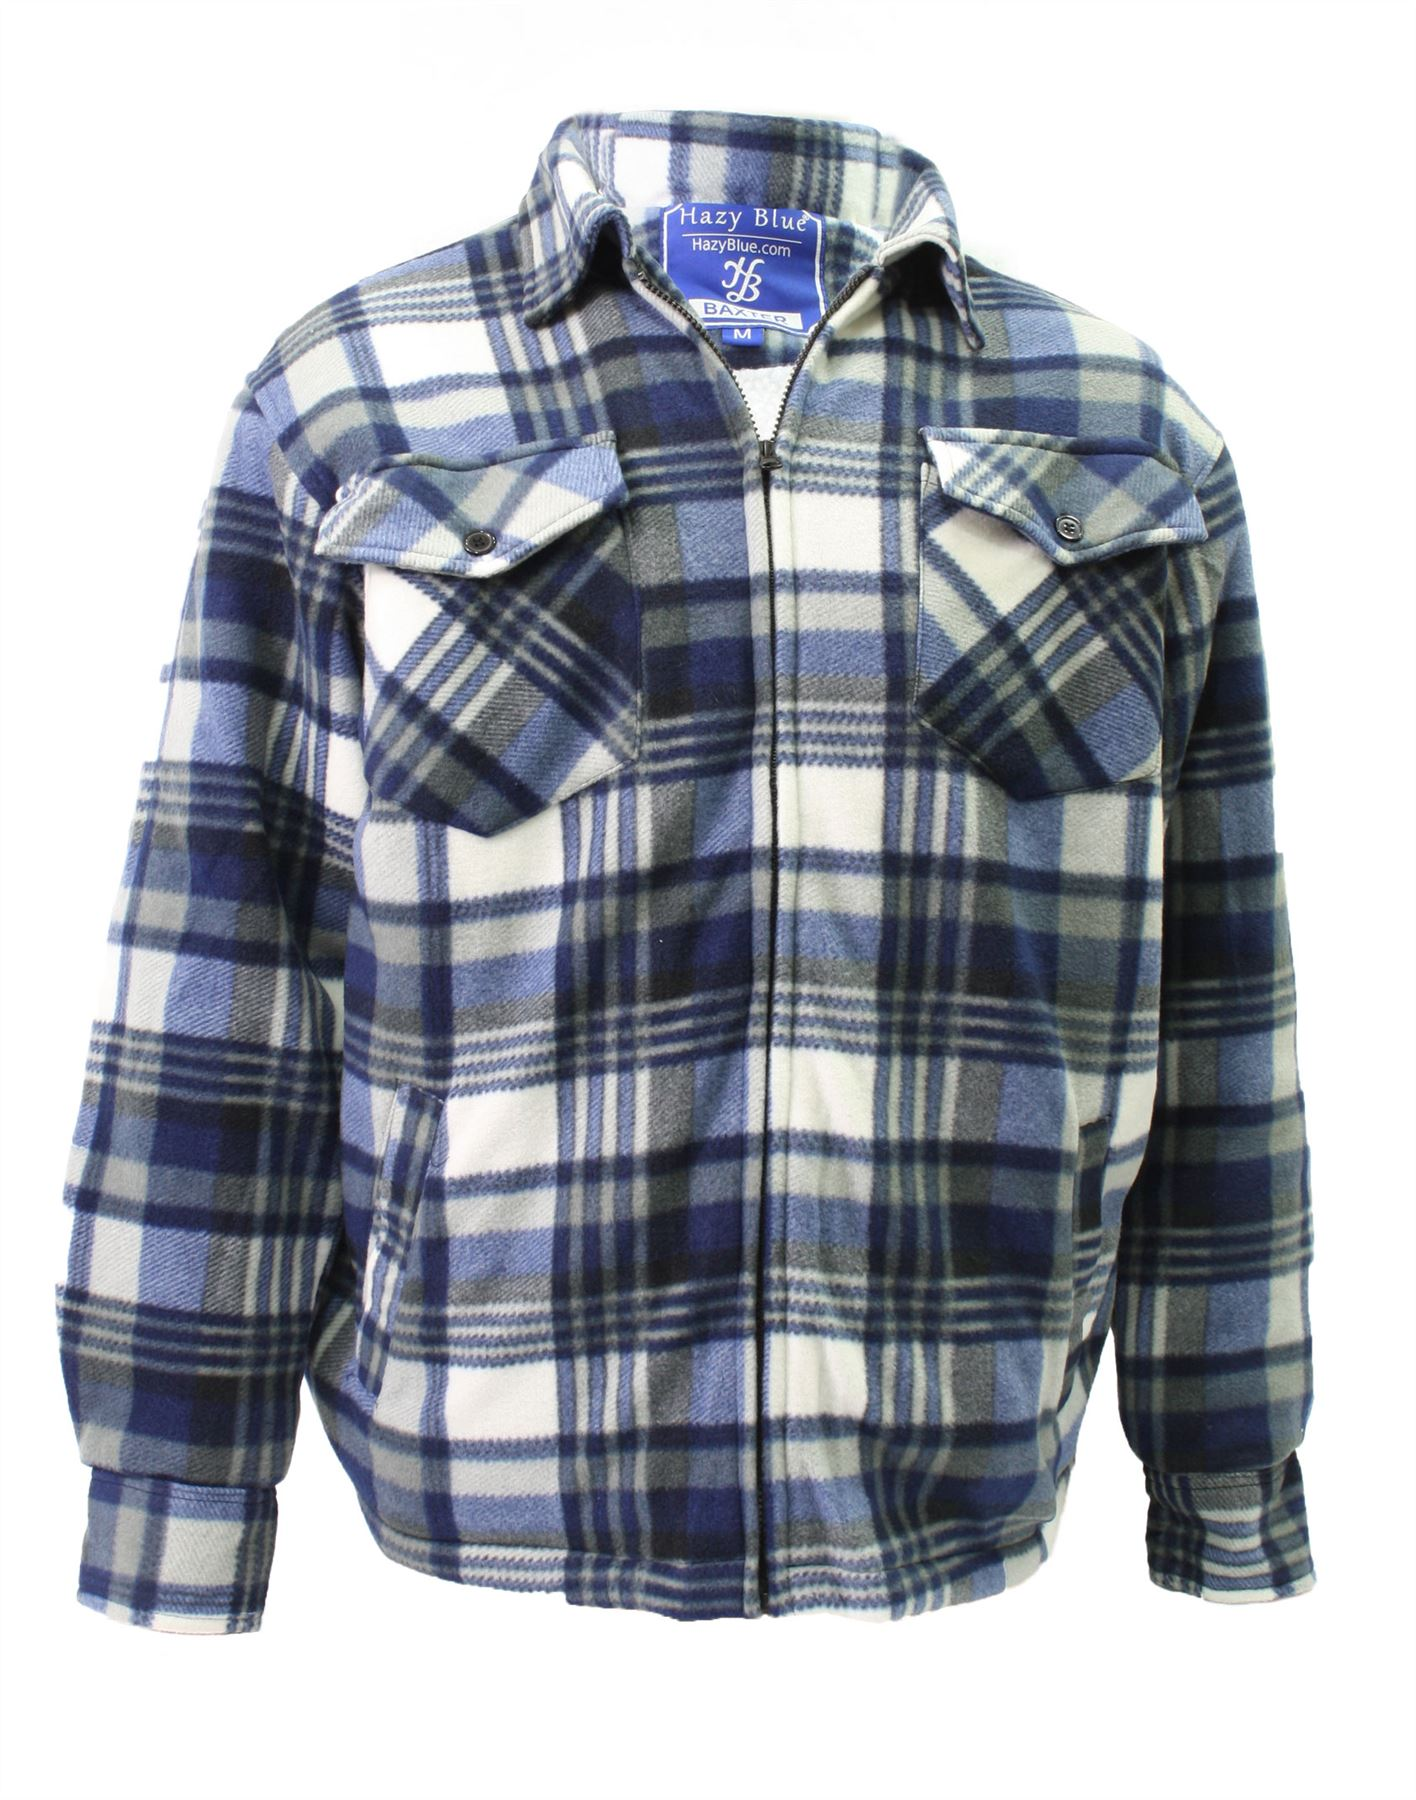 Shirt jacket design - Mens Sherpa Fleece Padded Fur Lined Shirt Jacket